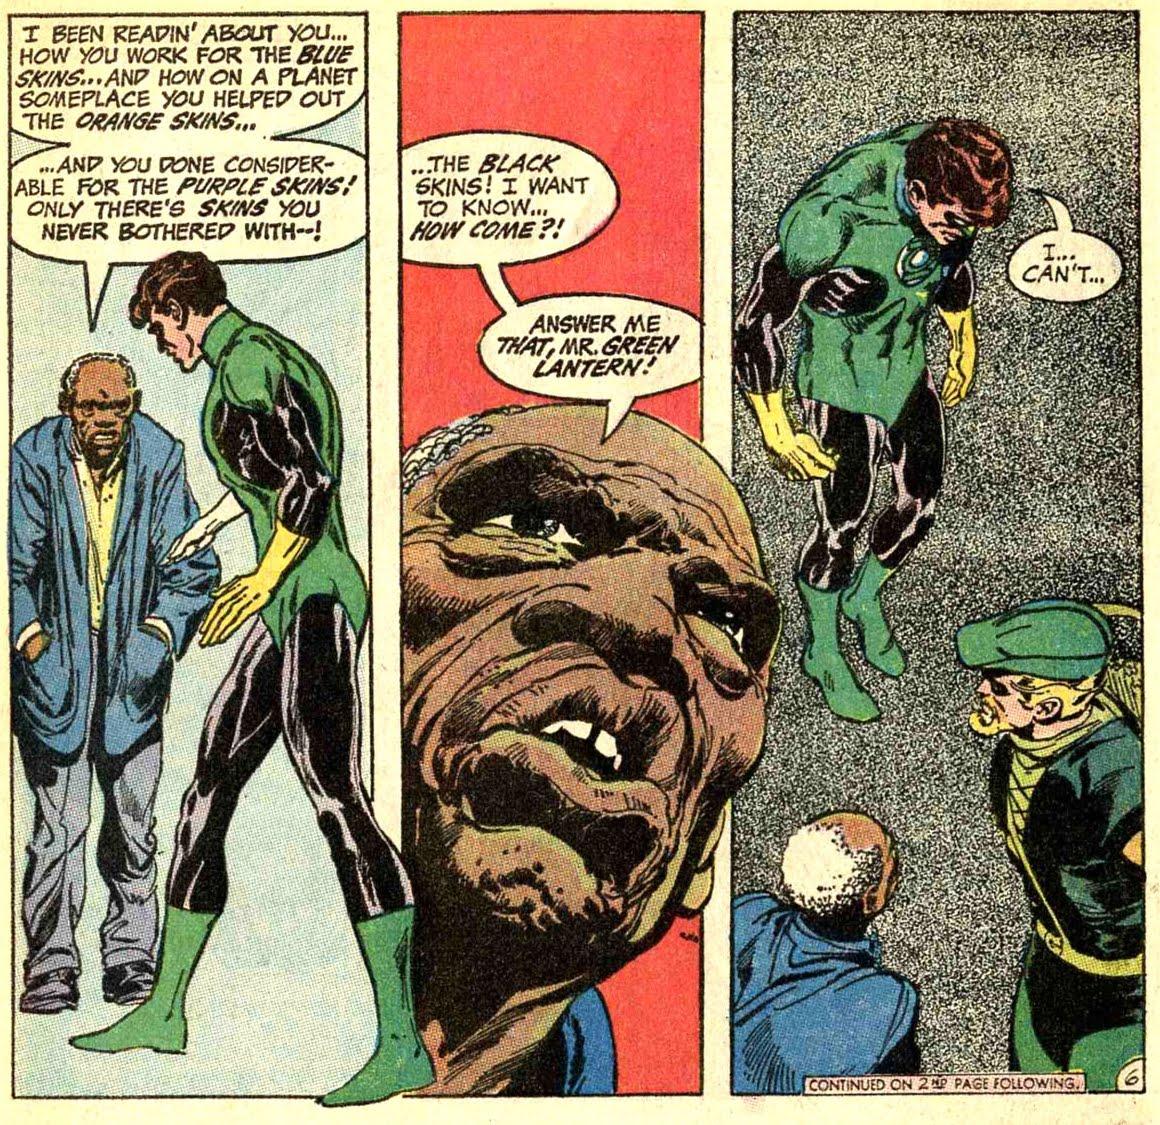 [DC Comics] Green Lantern: Discusión General - Página 2 GREEN-LANTERN-076